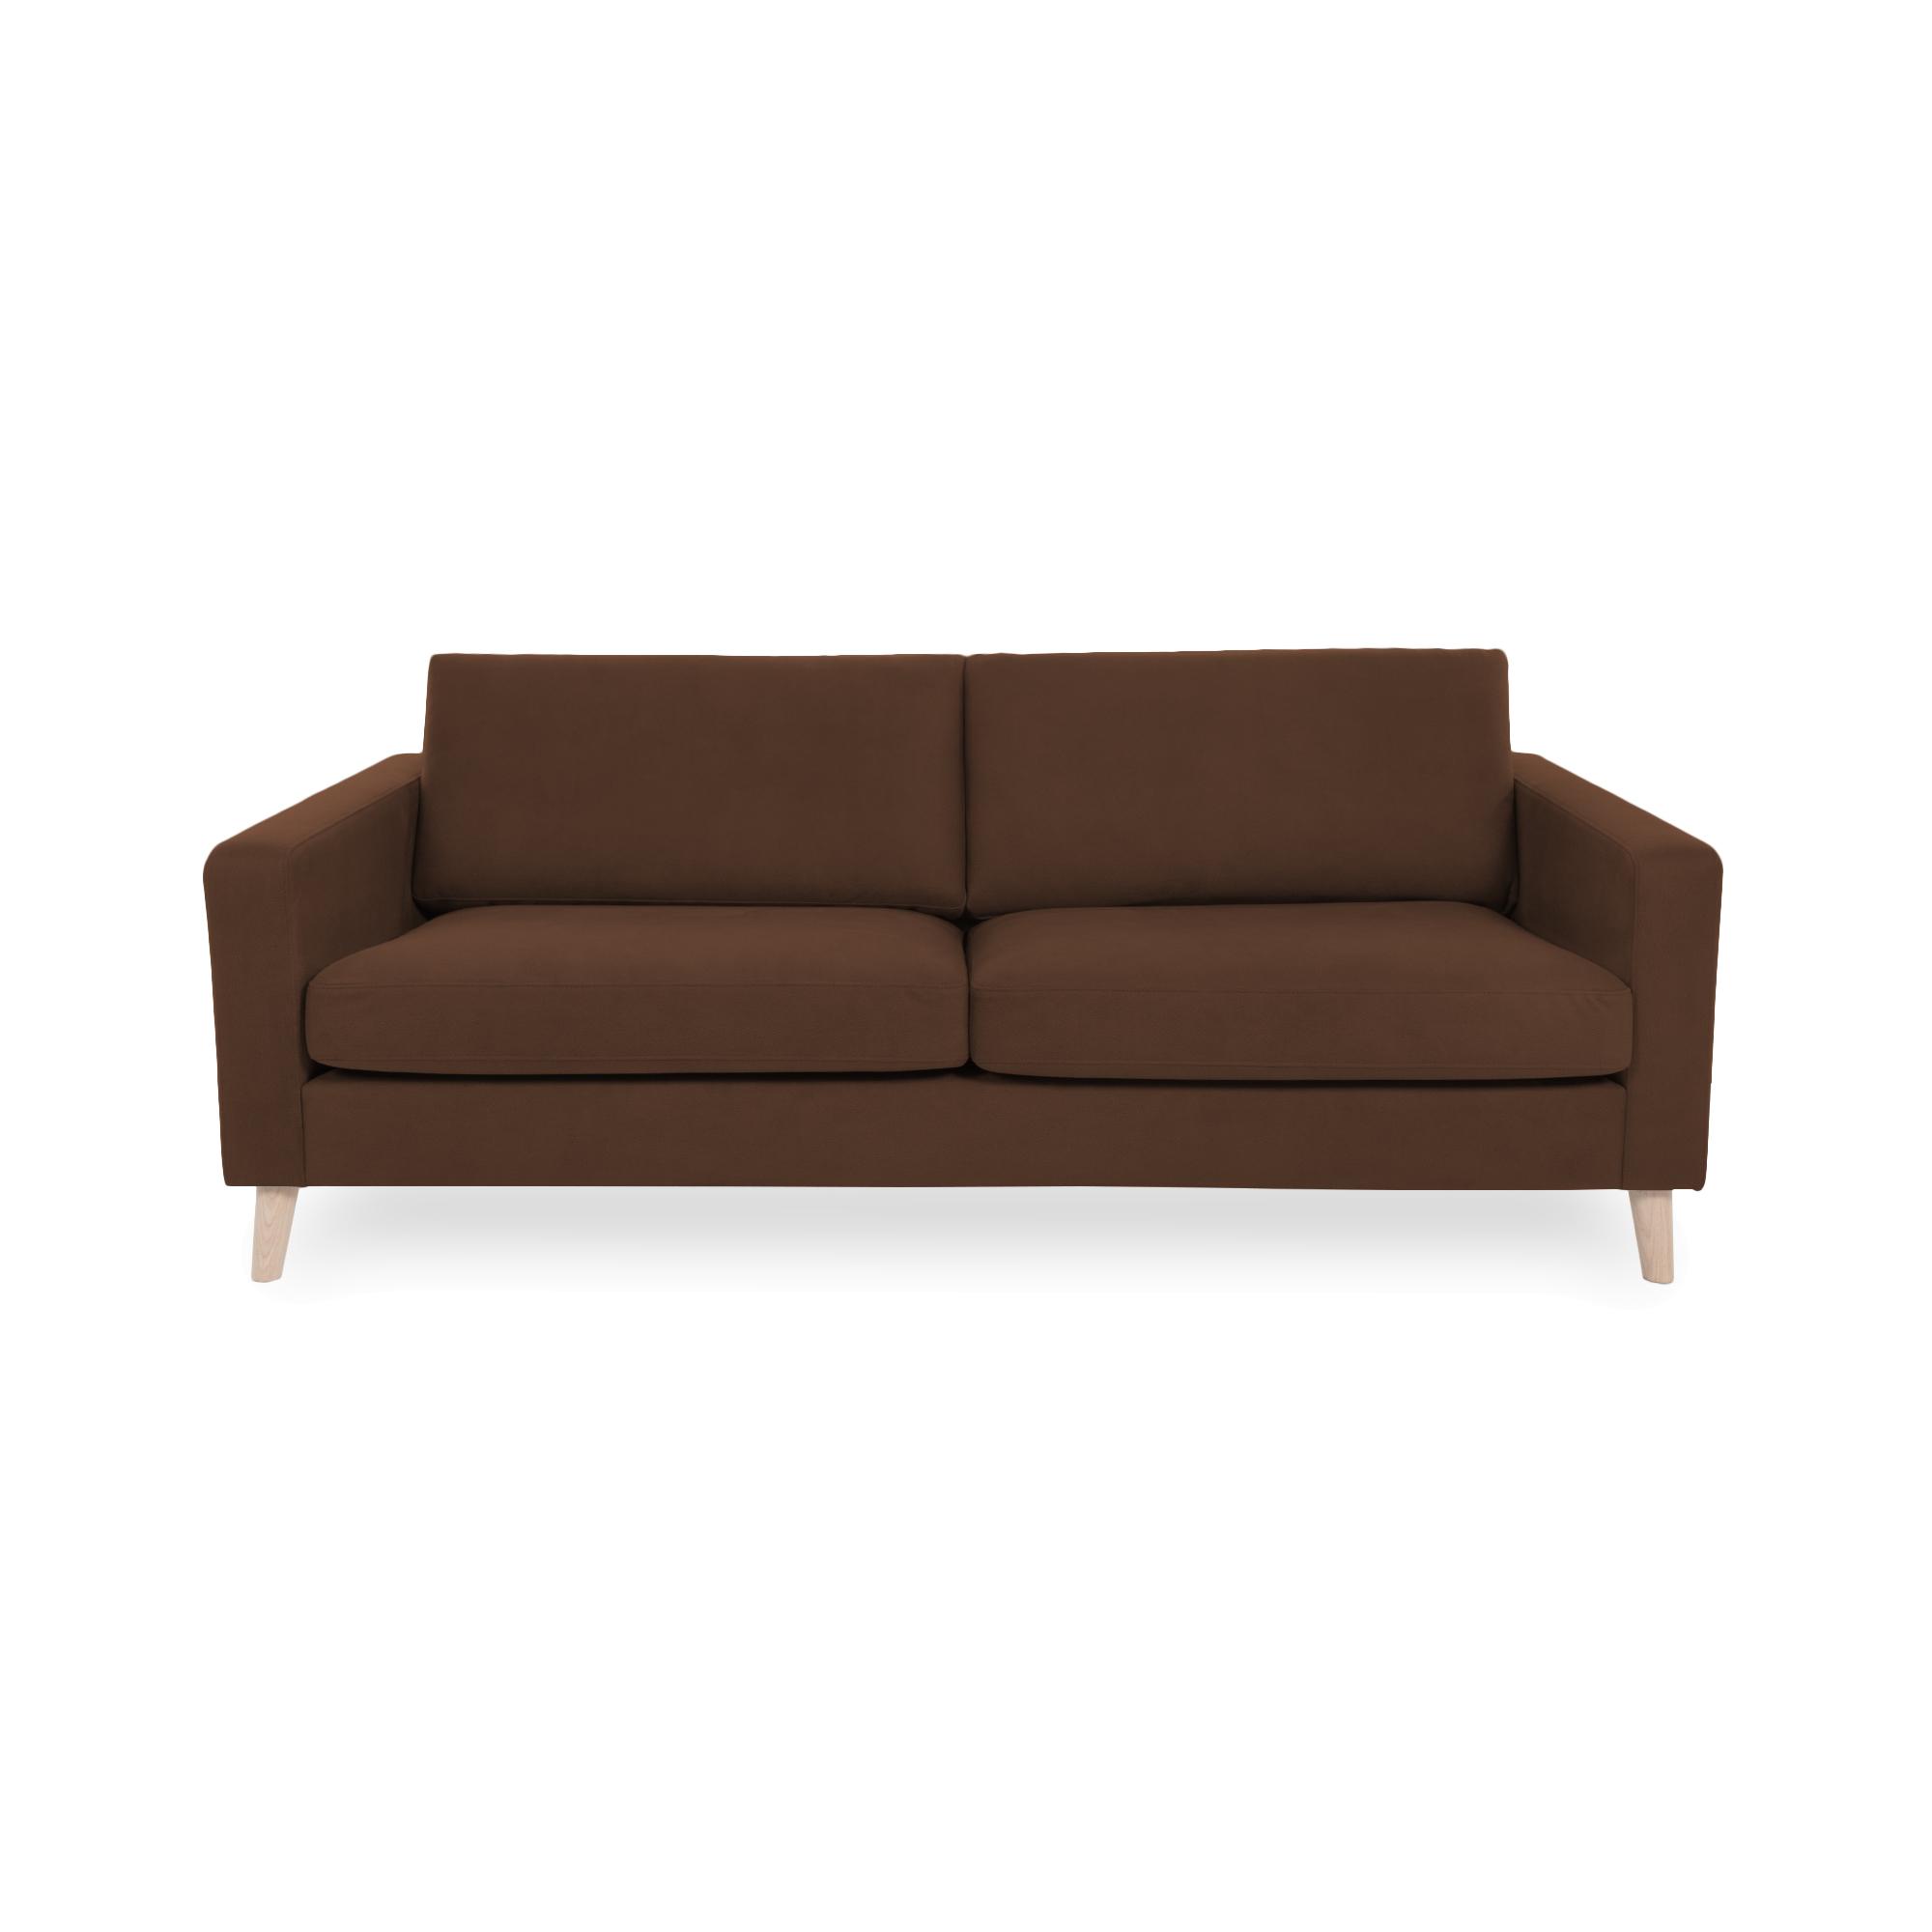 Canapea Fixa 3 locuri Tom Cognac/Natural